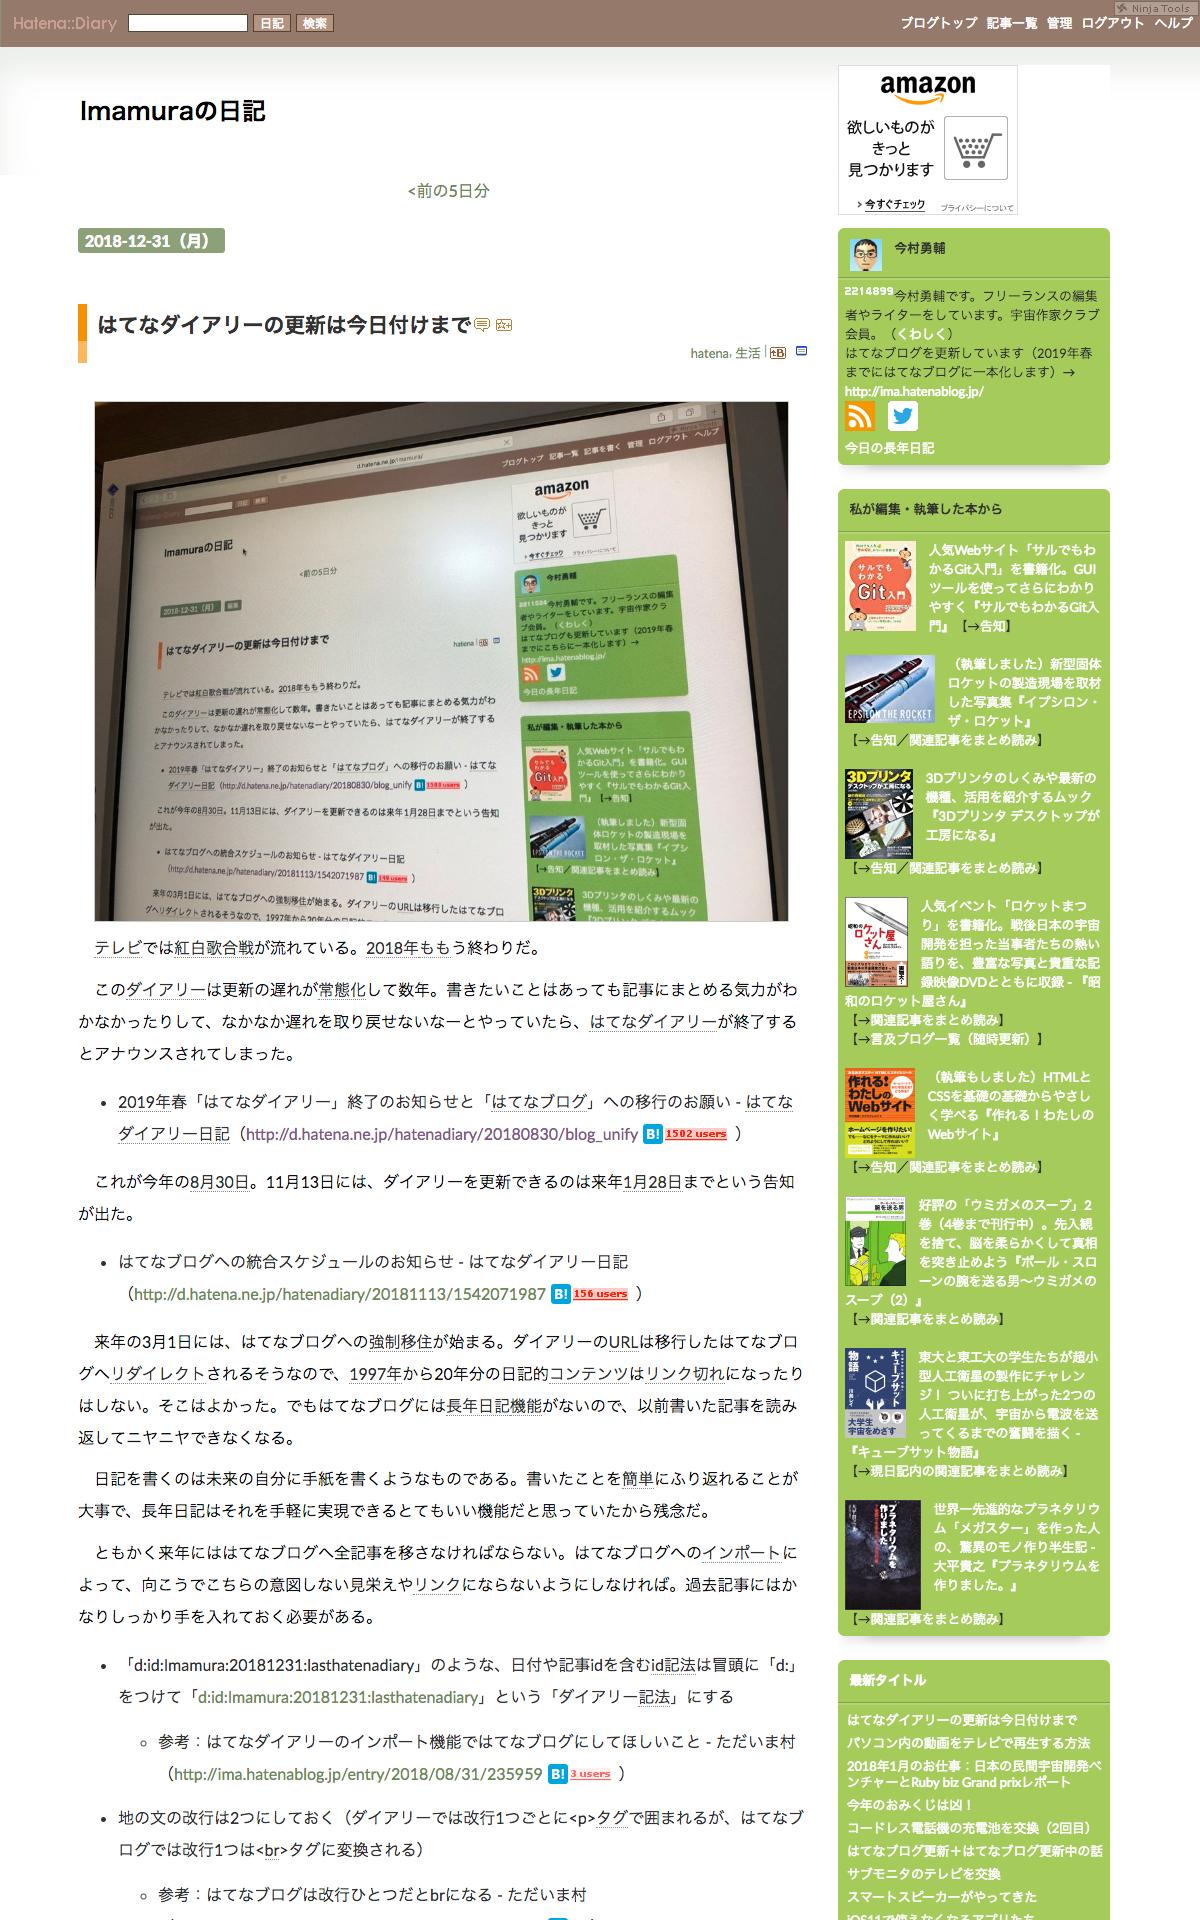 f:id:Imamura:20190219100932p:plain